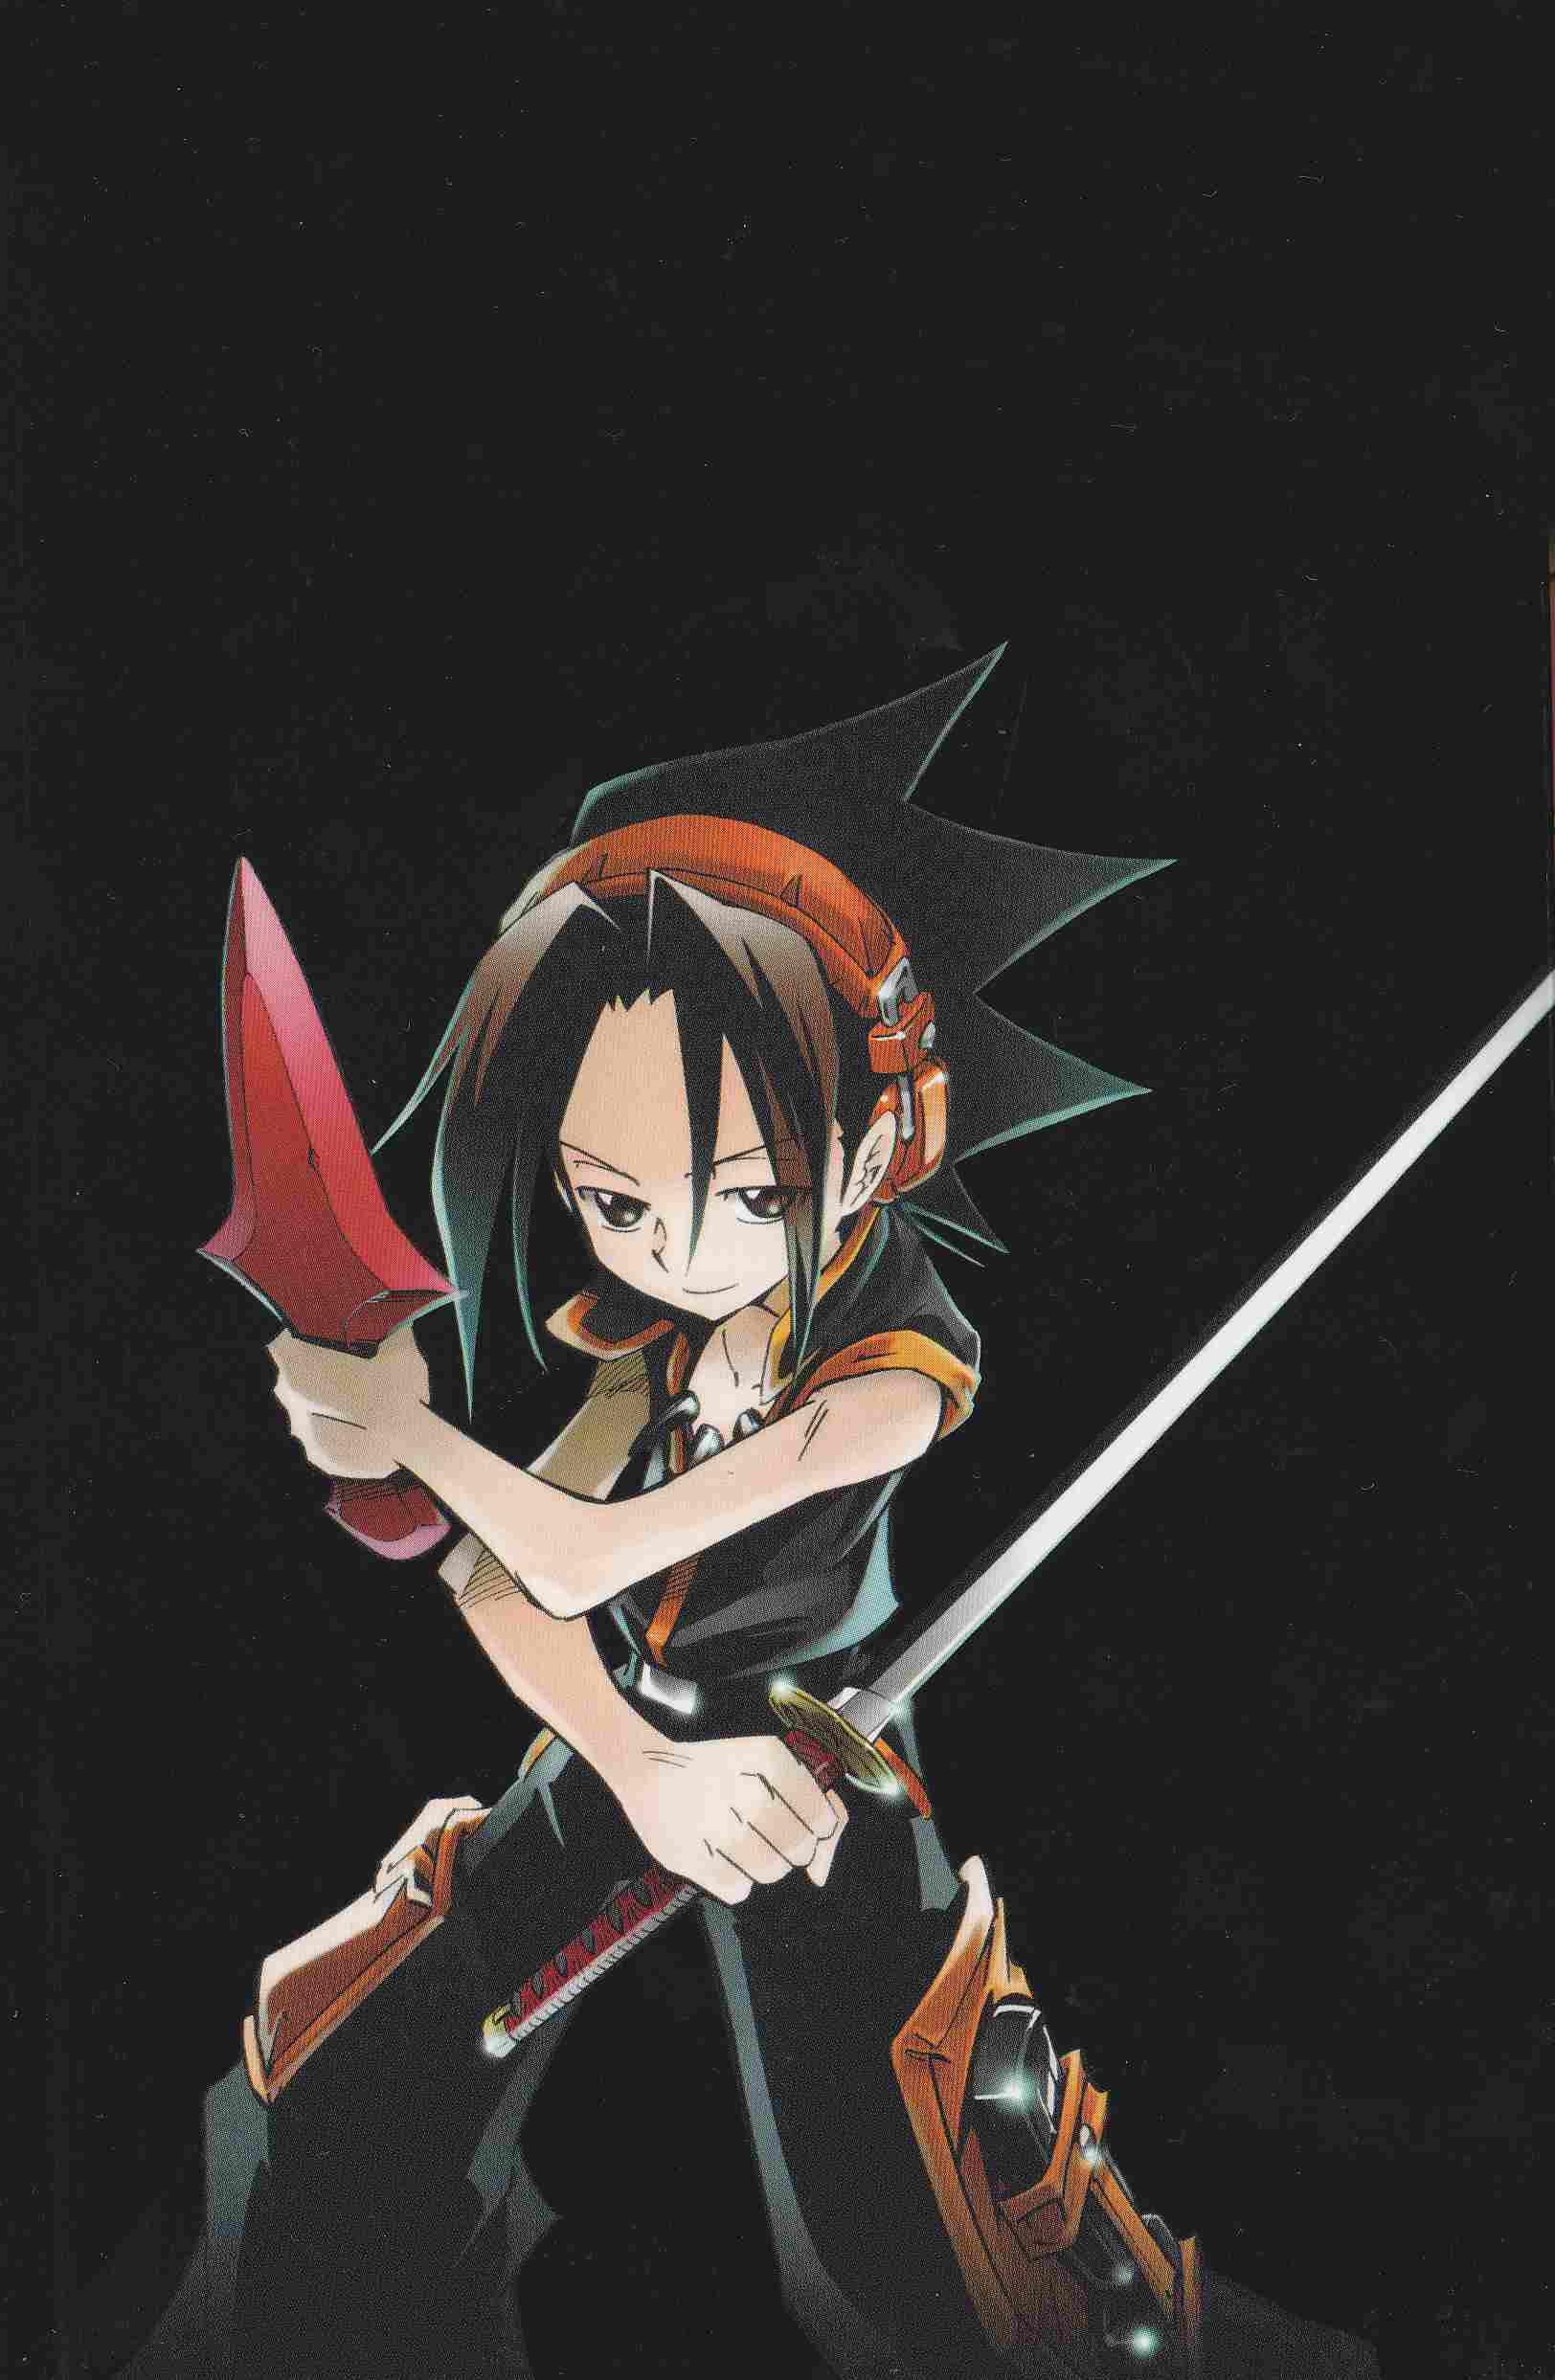 Anime boy black hair kawaii download shaman king yoh  x  minitokyo  nerd